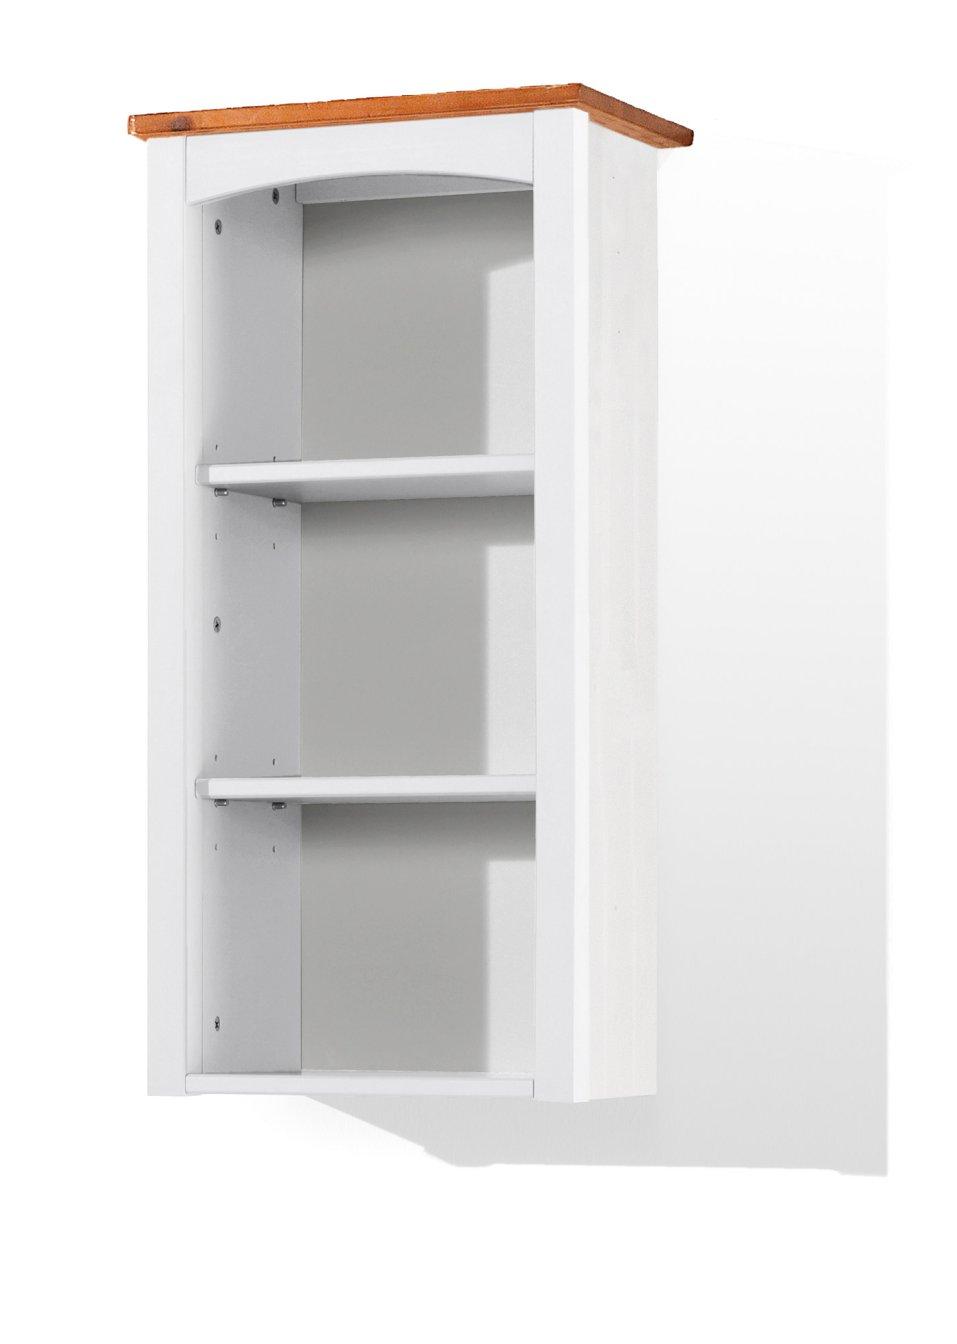 skandinavisches lebensgef hl im badezimmer offenes h ngeregal paula wei offen. Black Bedroom Furniture Sets. Home Design Ideas